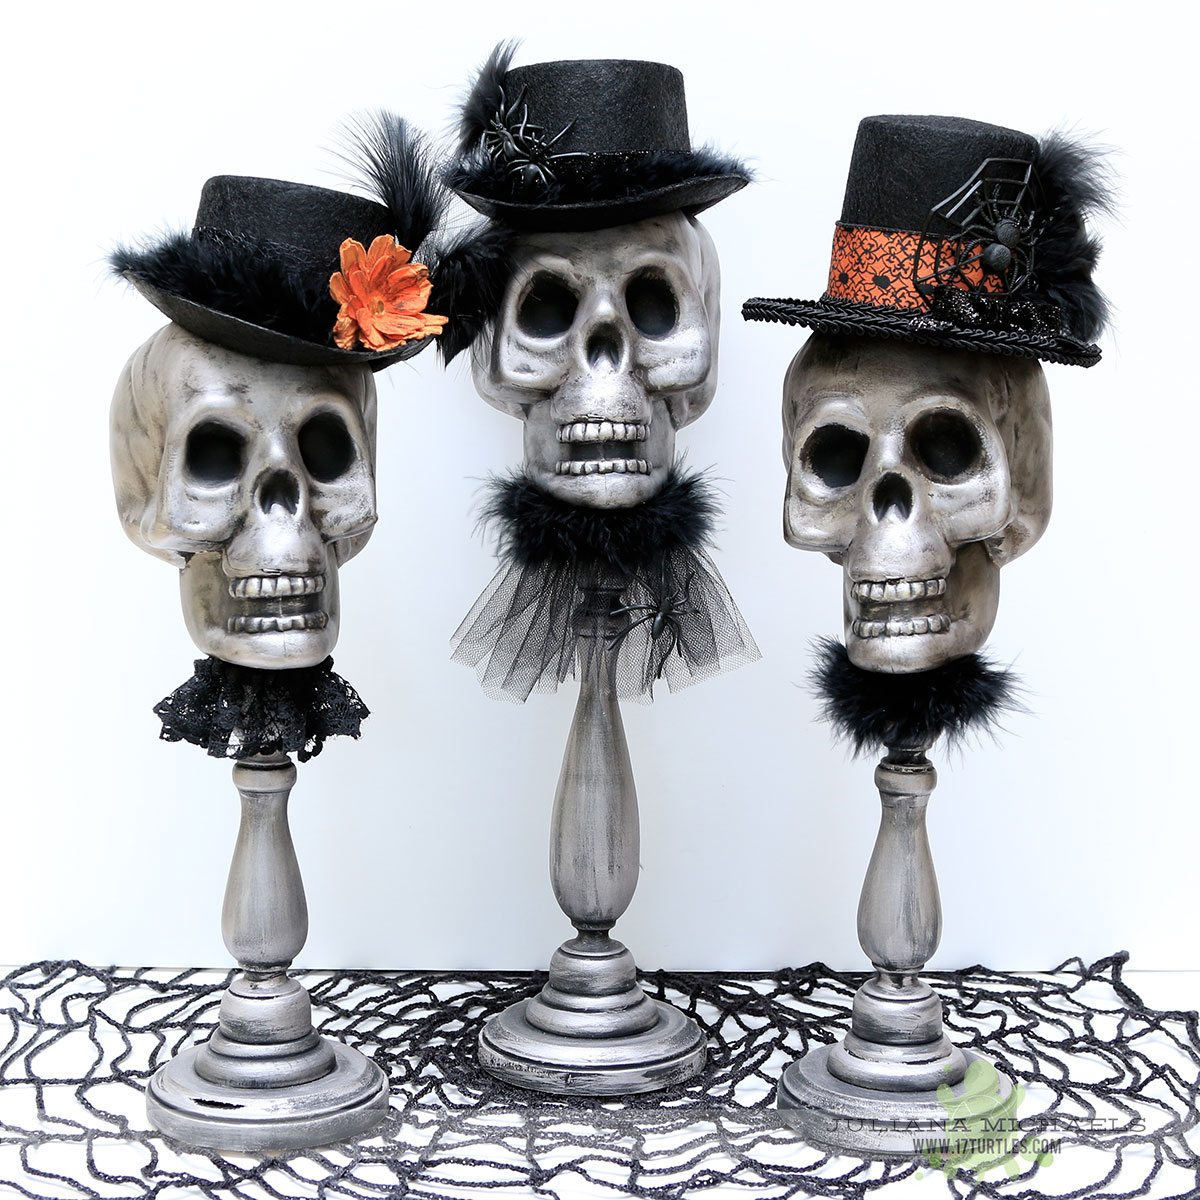 Halloween Skull Decorations.Dollar Tree Halloween Skull Decor 17turtles